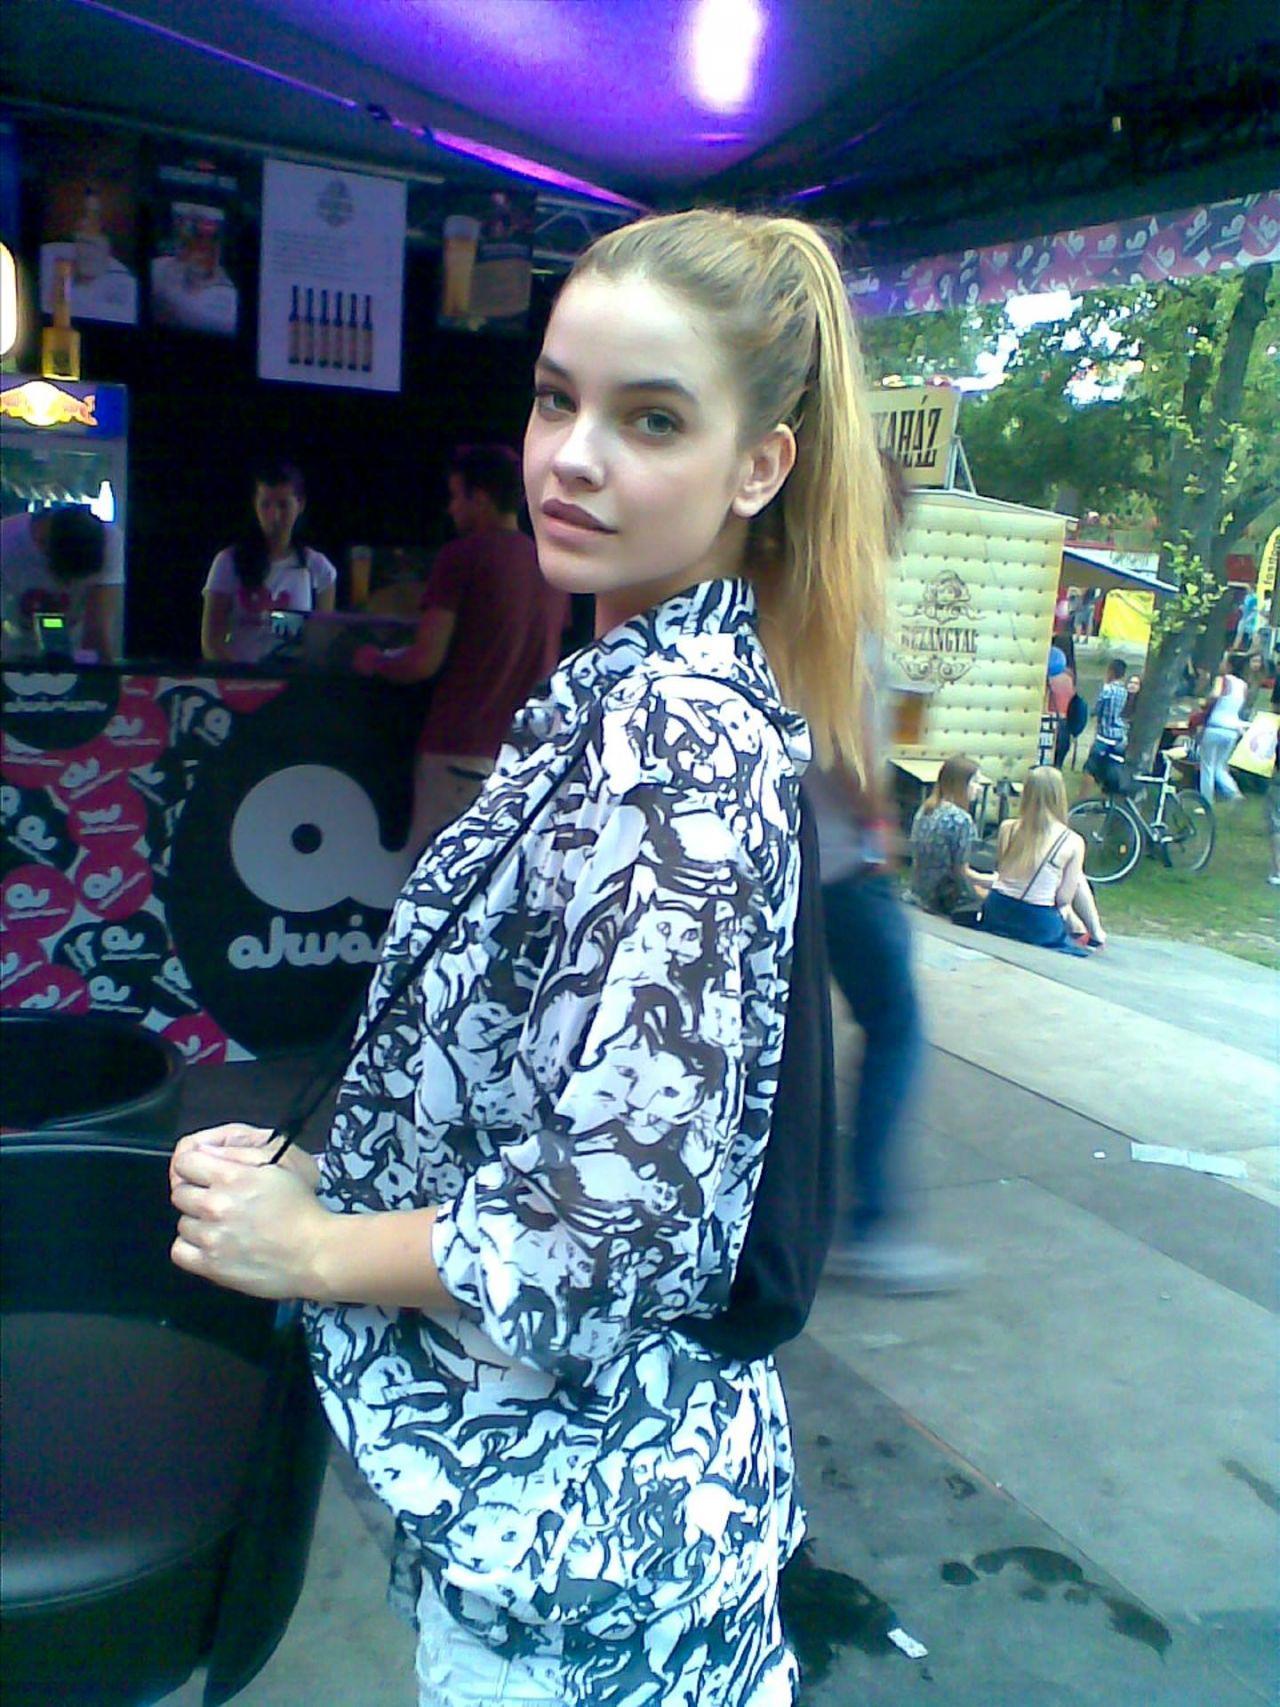 Citi Bike Miami >> Barbara Palvin at Sziget Festival at Óbudai Island in Budapest - August 2014